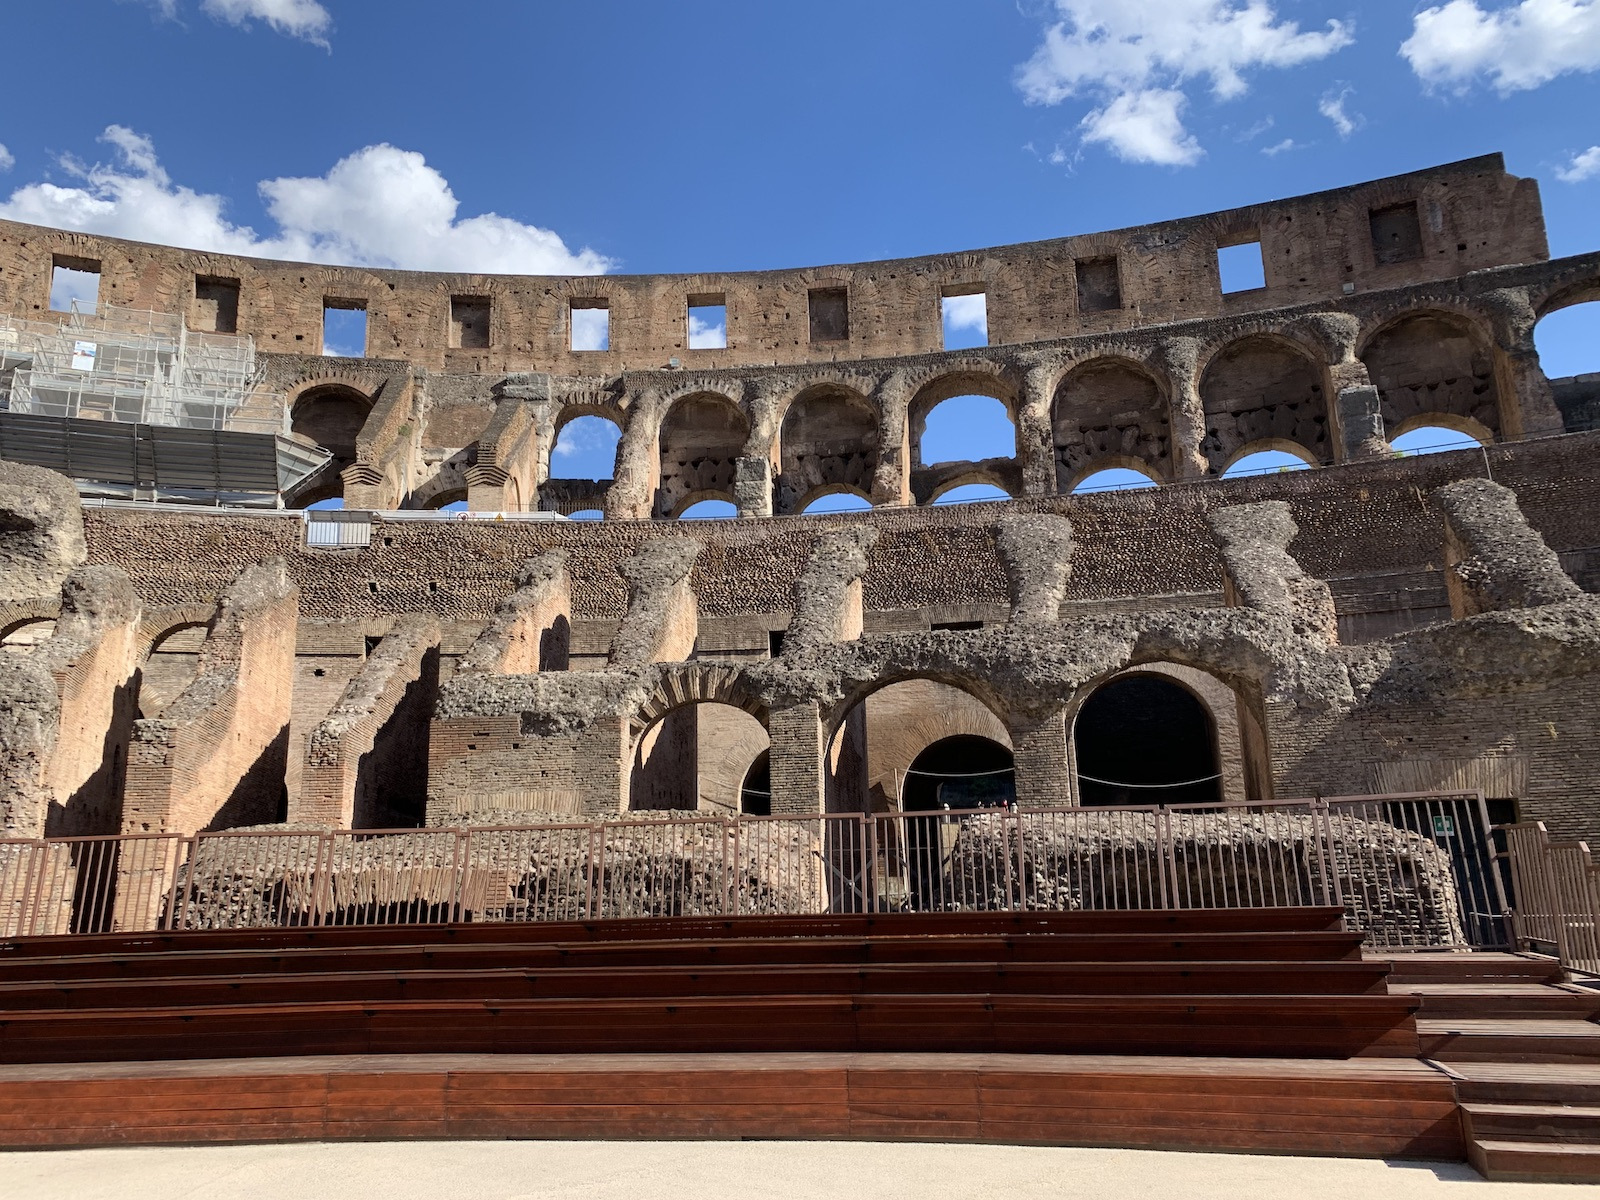 Colosseum falai